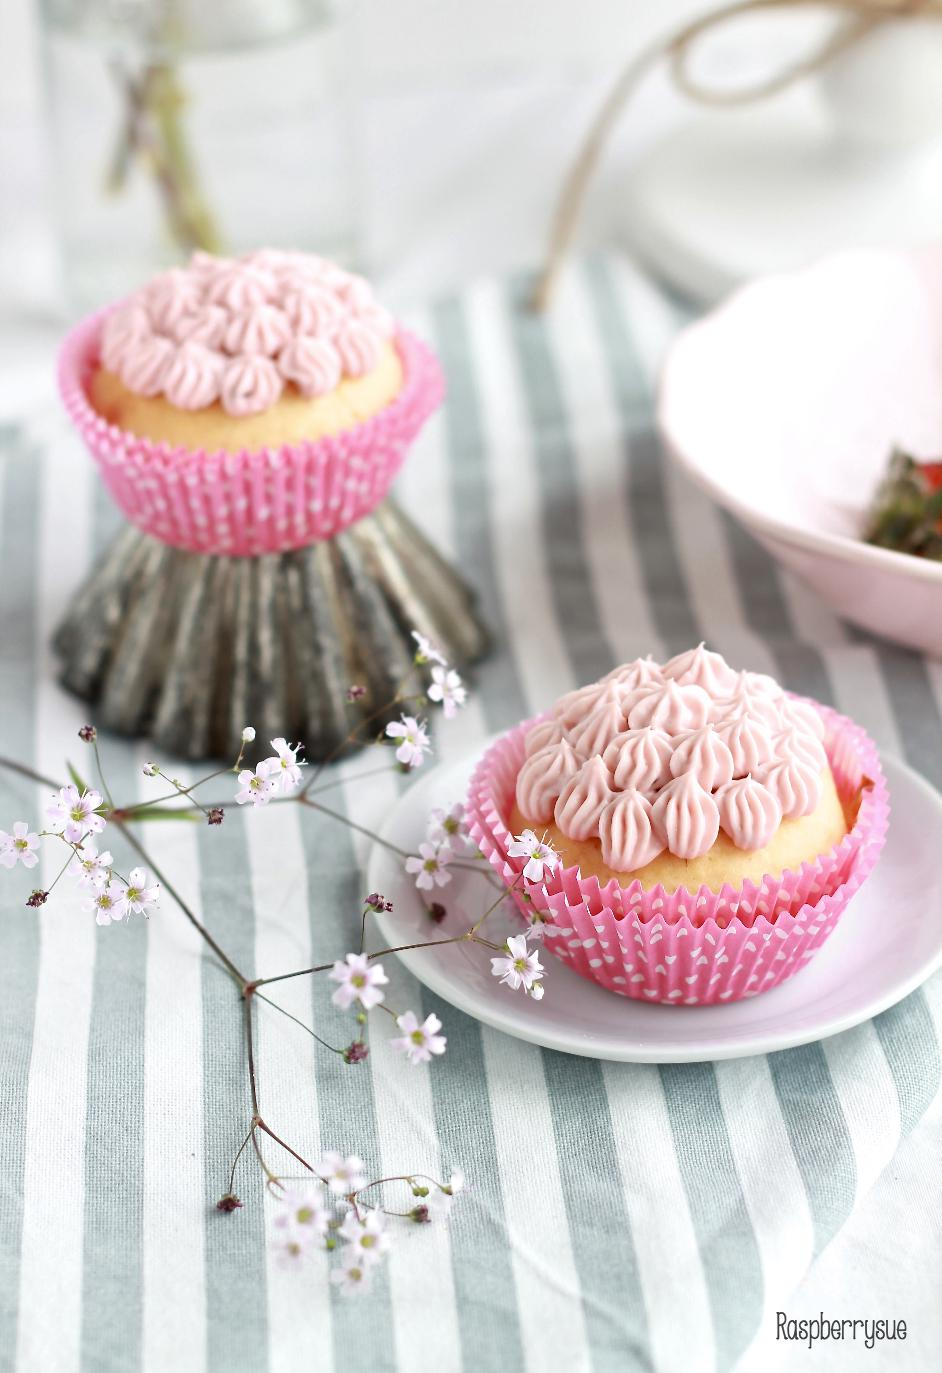 Happy Birthday Himbeer Kokos Cupcakes Raspberrysue